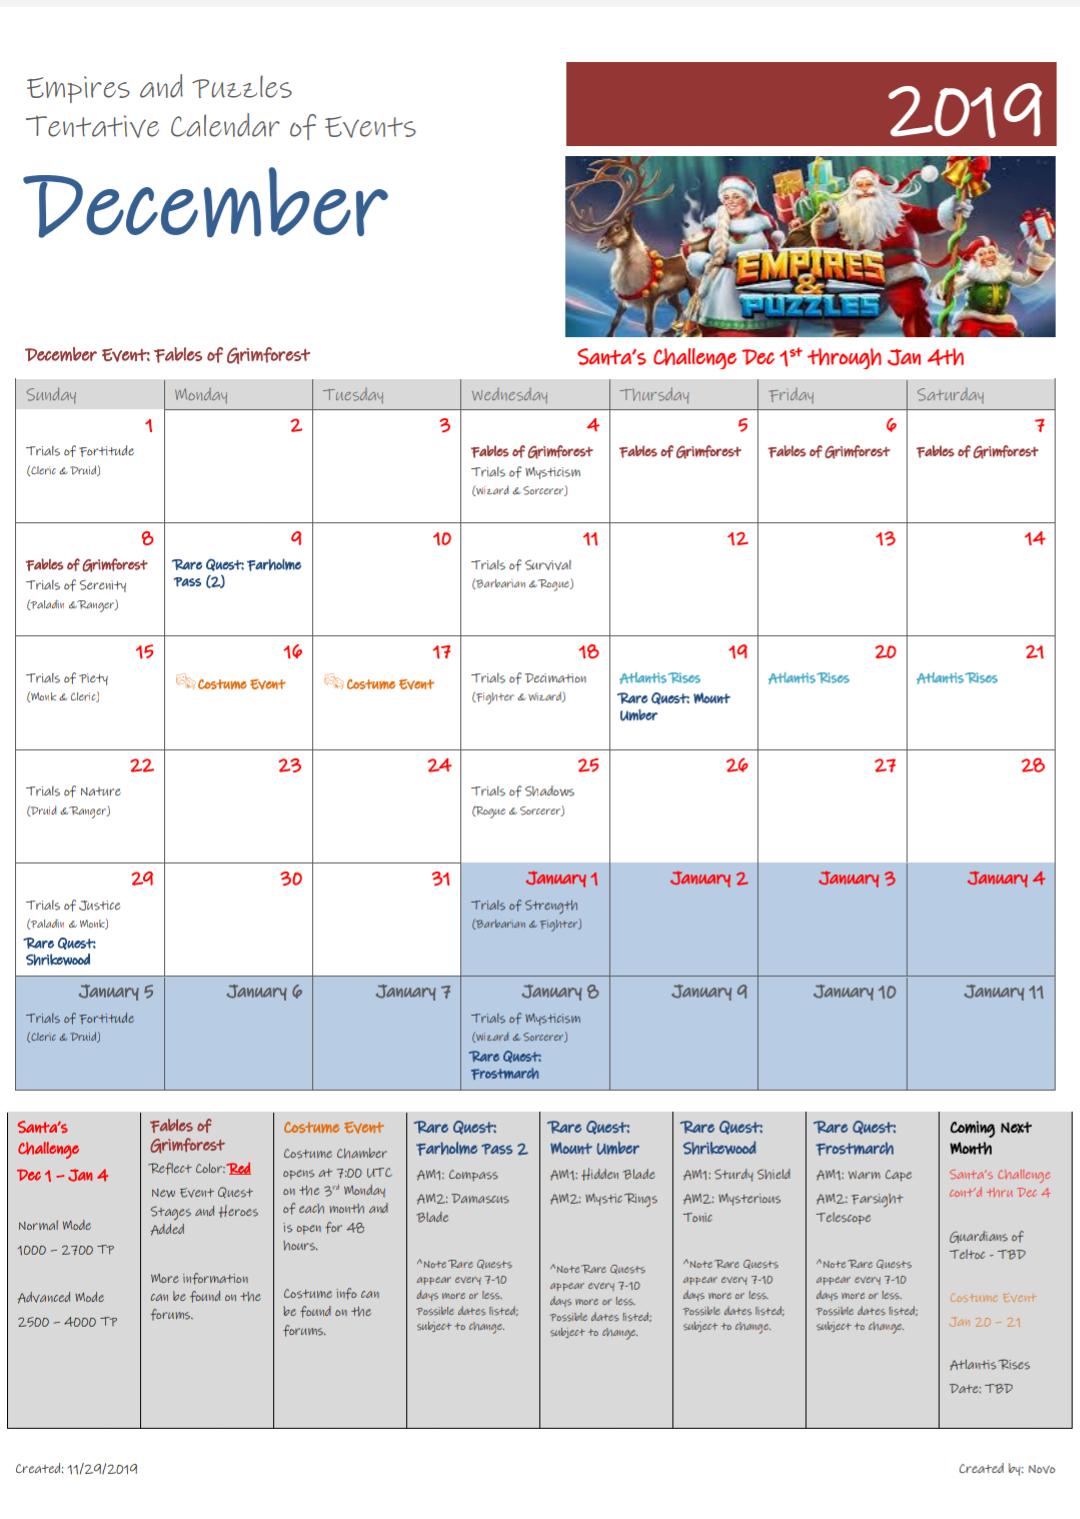 December 2019 Calendar Of Events : Empiresandpuzzles throughout Empires And Puzzles Events Calendar